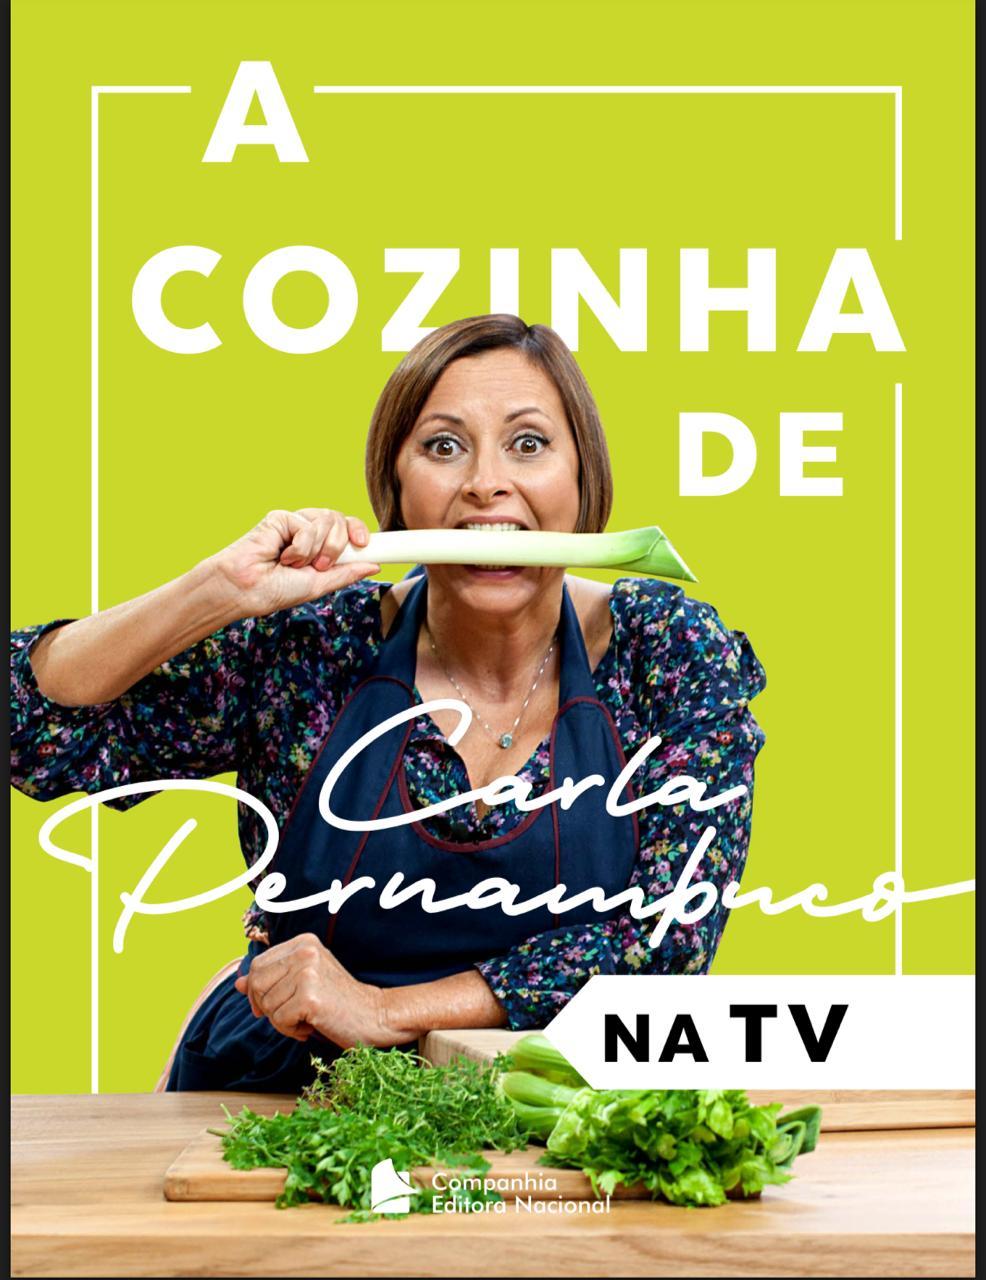 Carla Pernambuco  capa A cozinha de carla pernambuco - Essa guria Carla Pernambuco